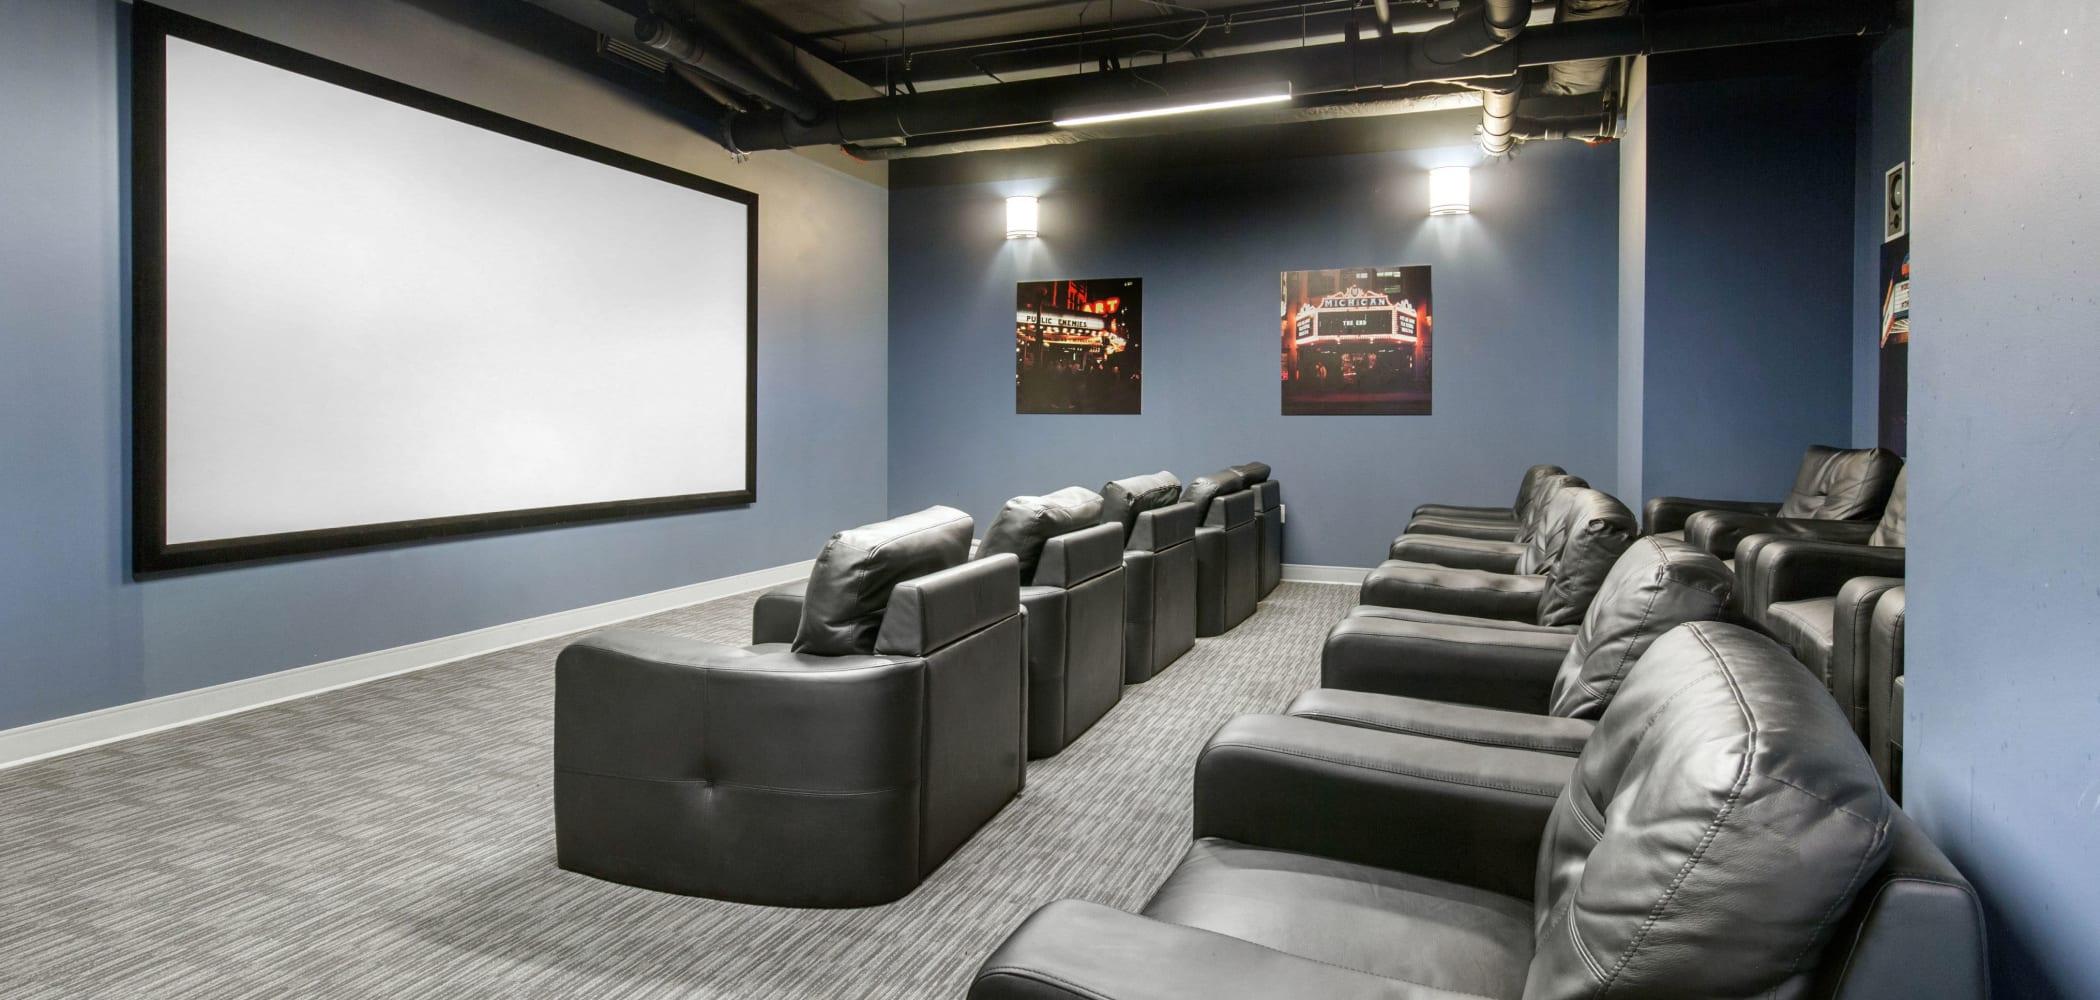 Movie theater at HERE Champaign in Champaign, Illinois